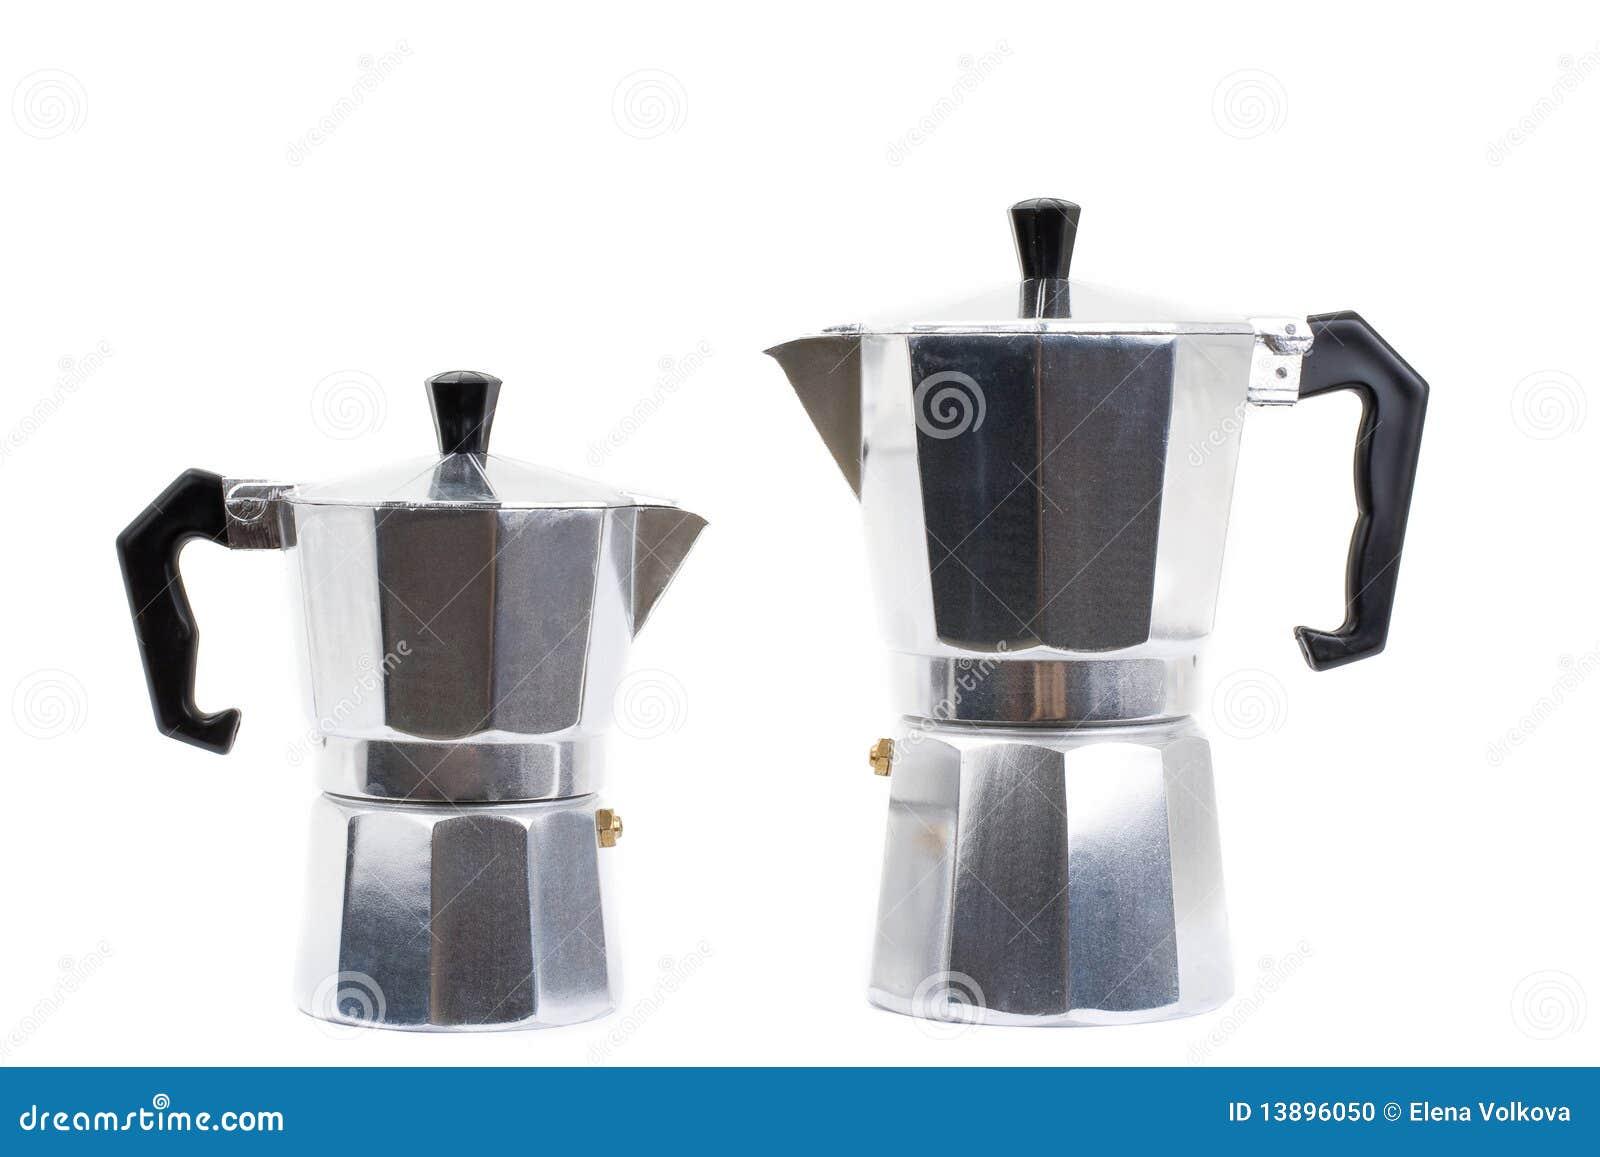 Italian Coffee Maker Isolated On White Background Stock Photo - Image: 13896050